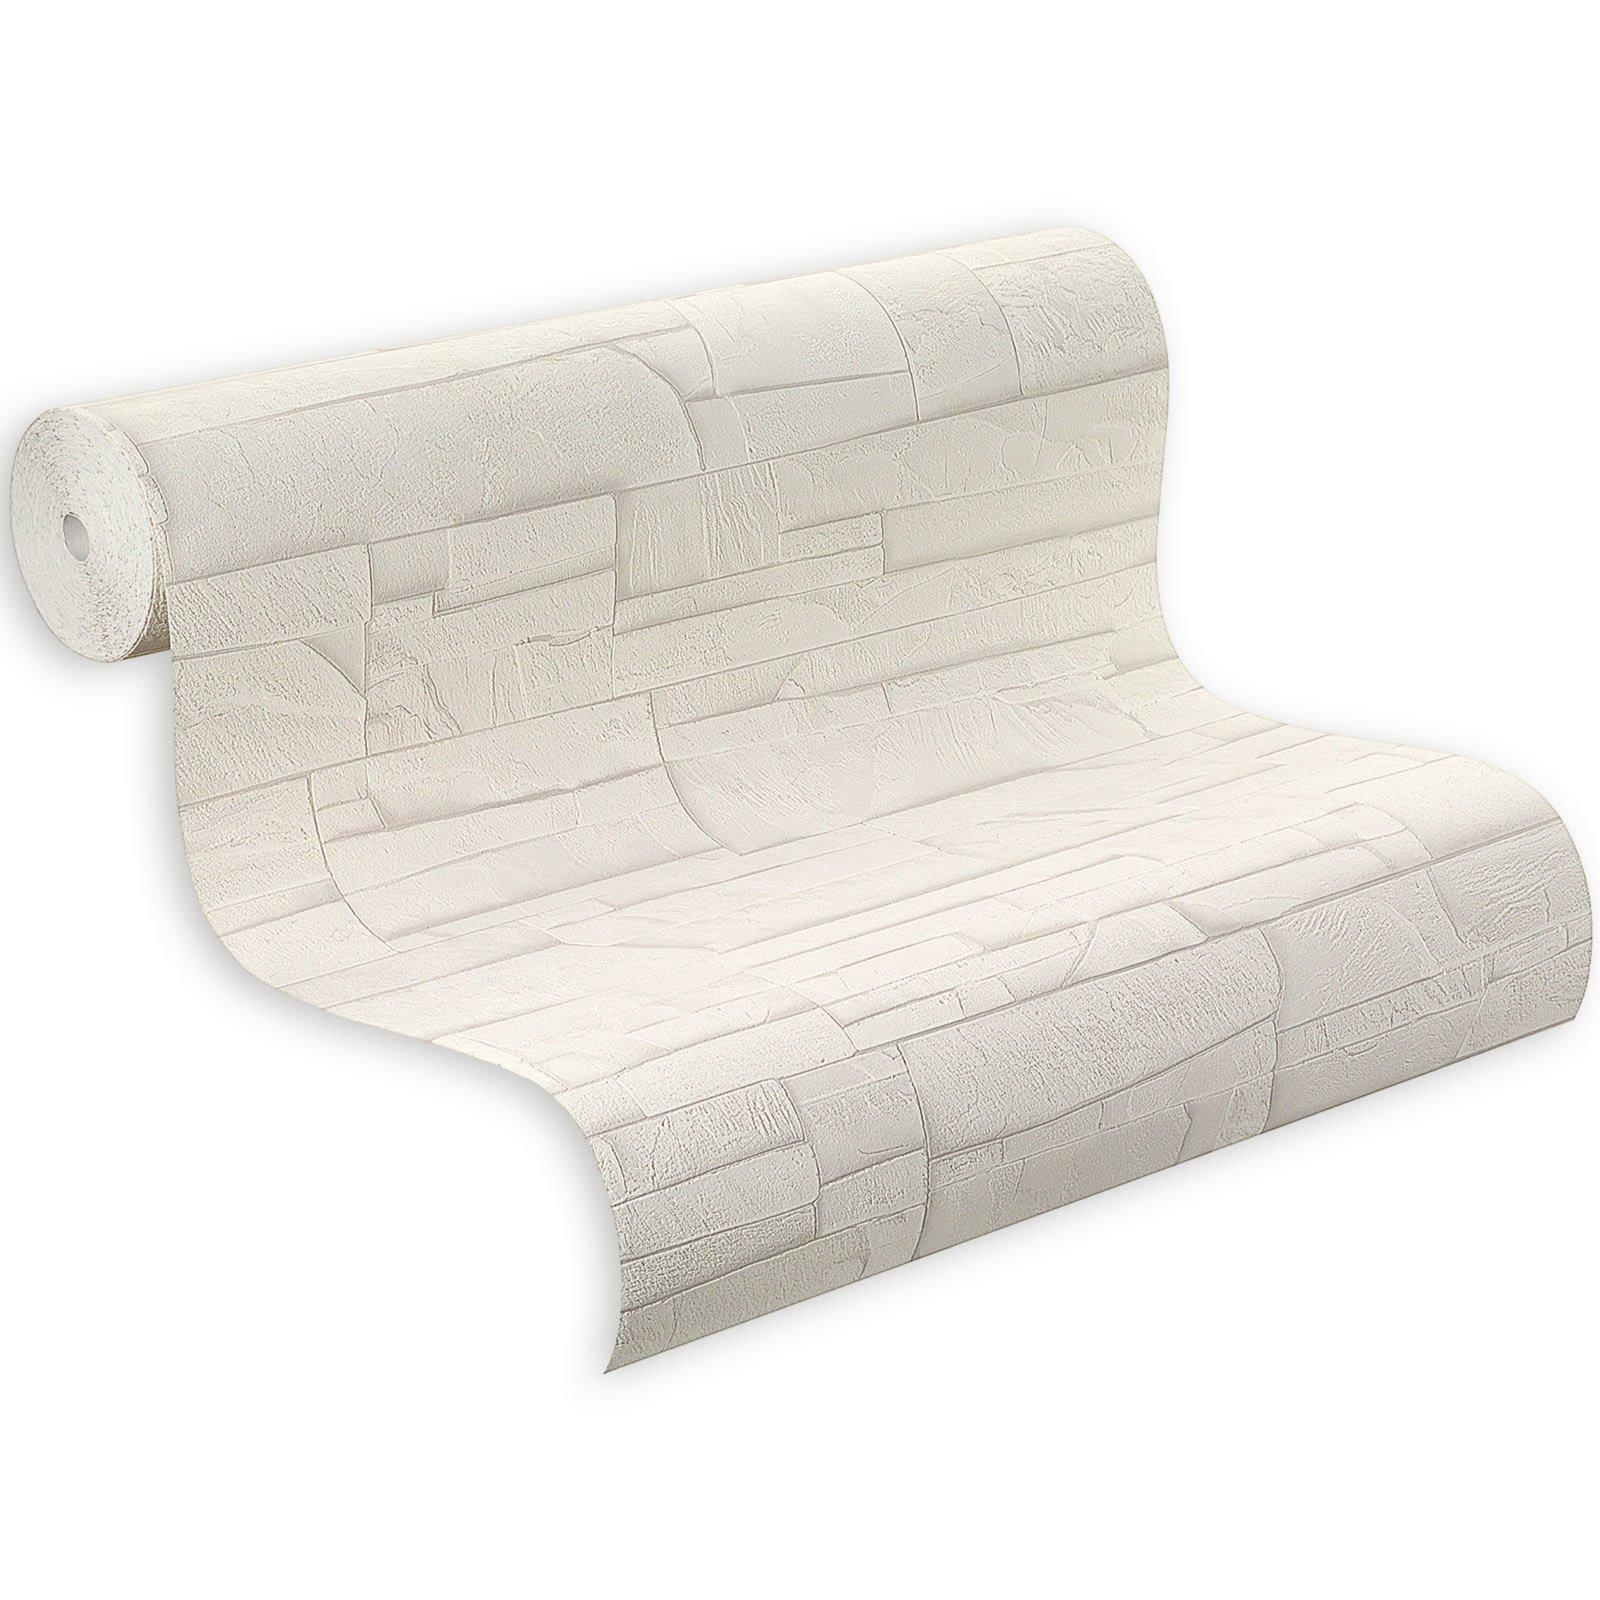 vliestapete wei. Black Bedroom Furniture Sets. Home Design Ideas